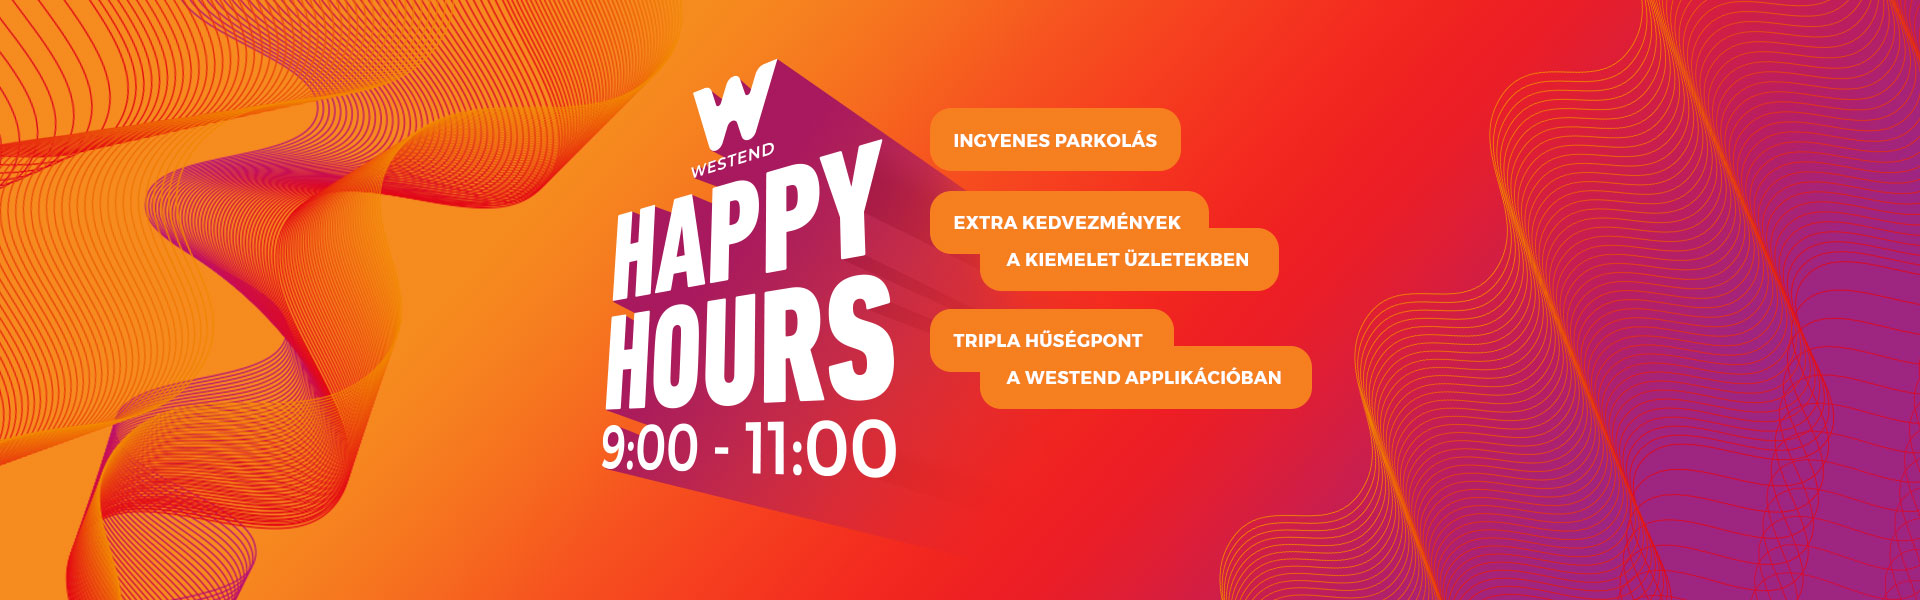 Happy Hours 9:00 - 11:00 között!